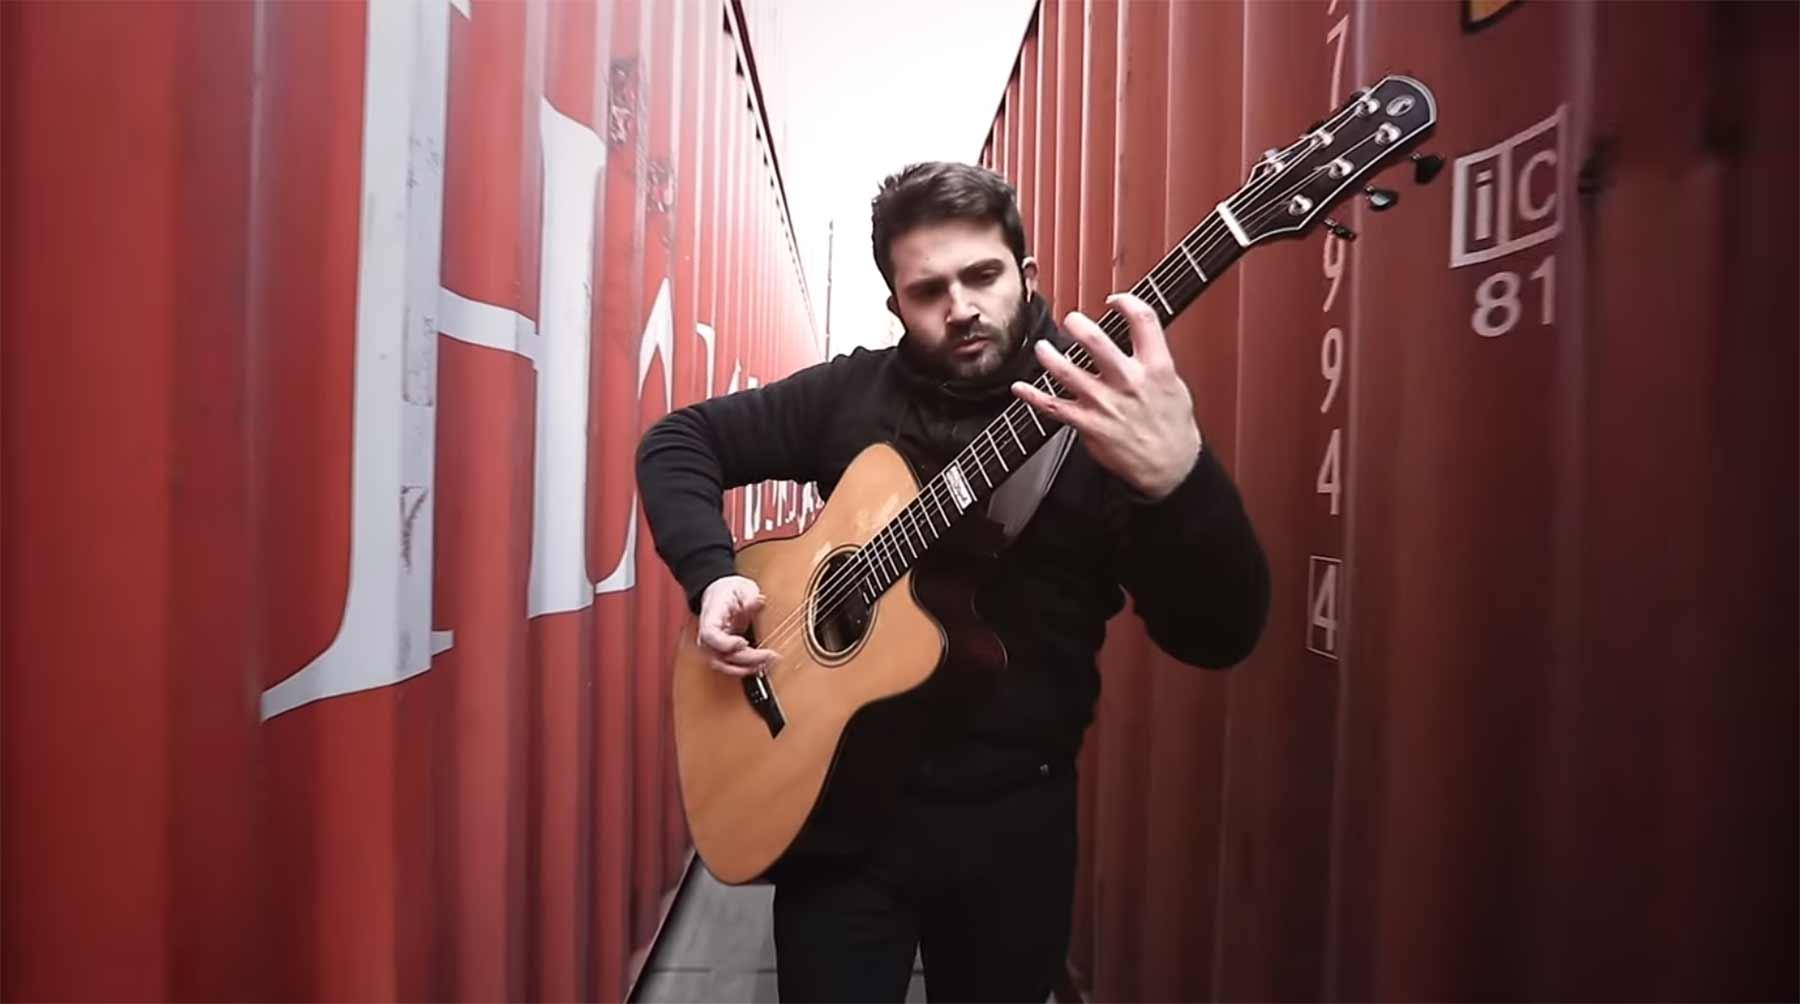 The Prodigy-Medley auf der Akustikgitarre